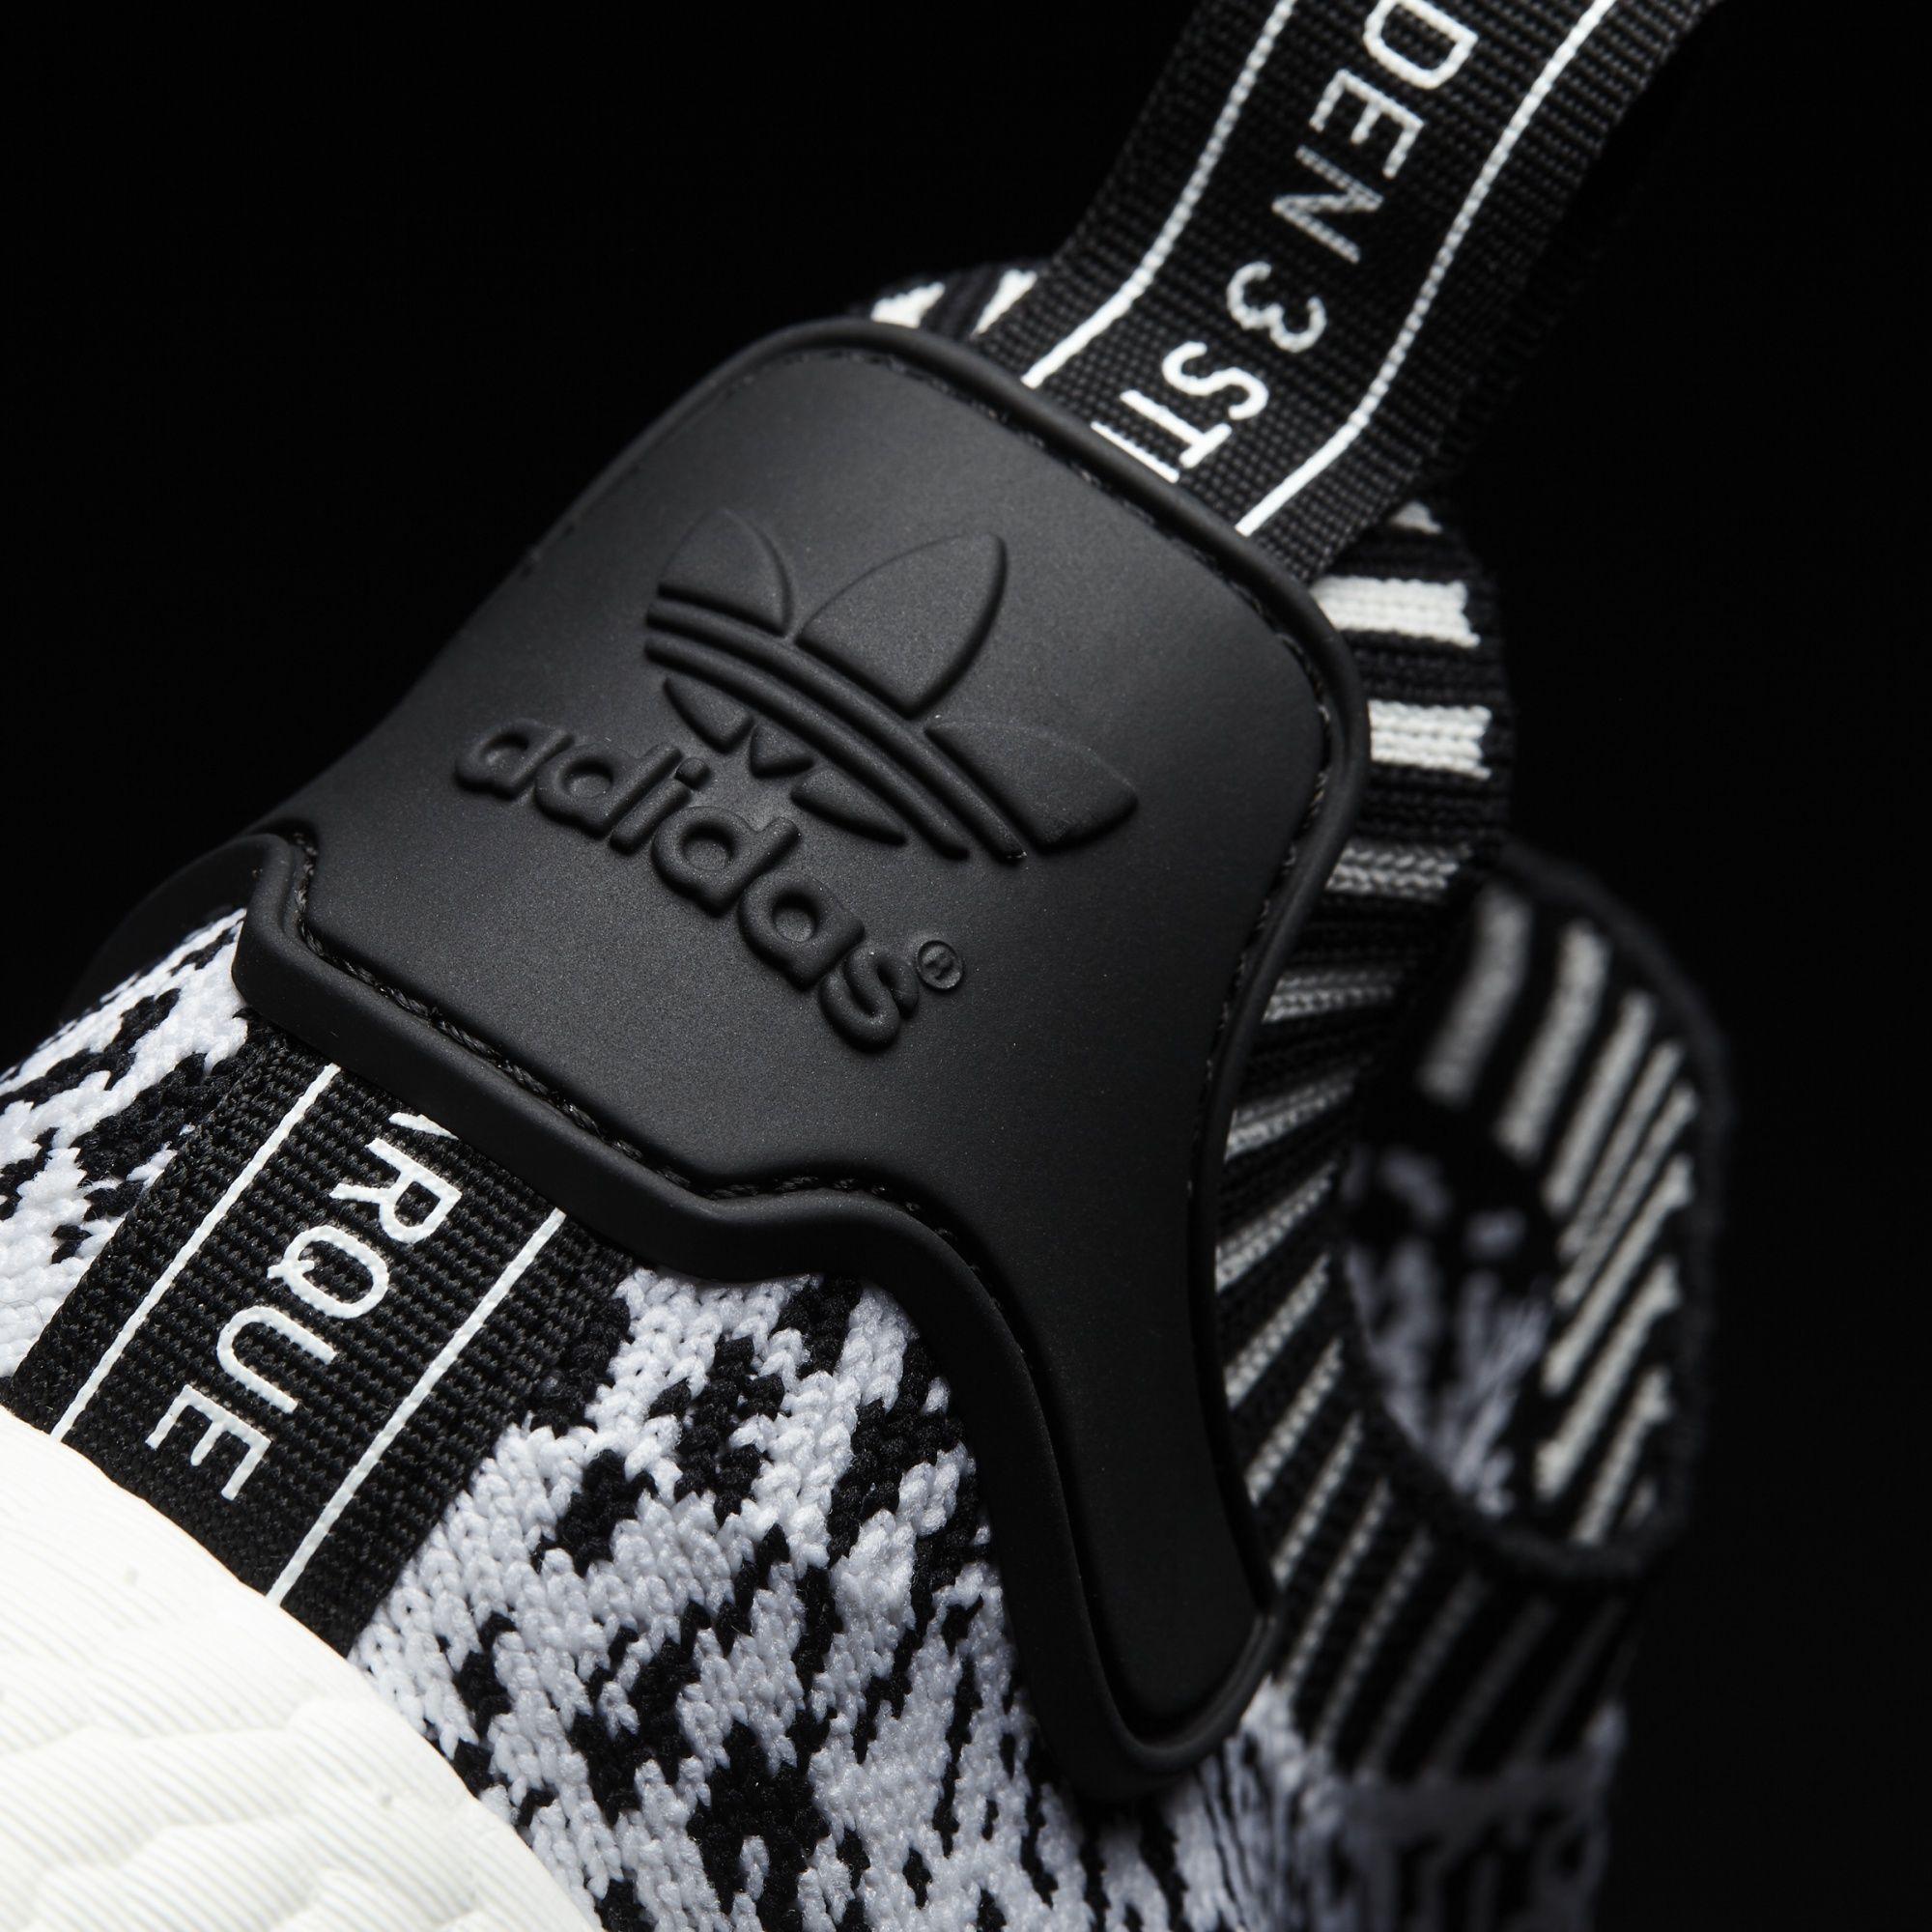 BZ0219 adidas NMD R1 Primeknit White Black 4